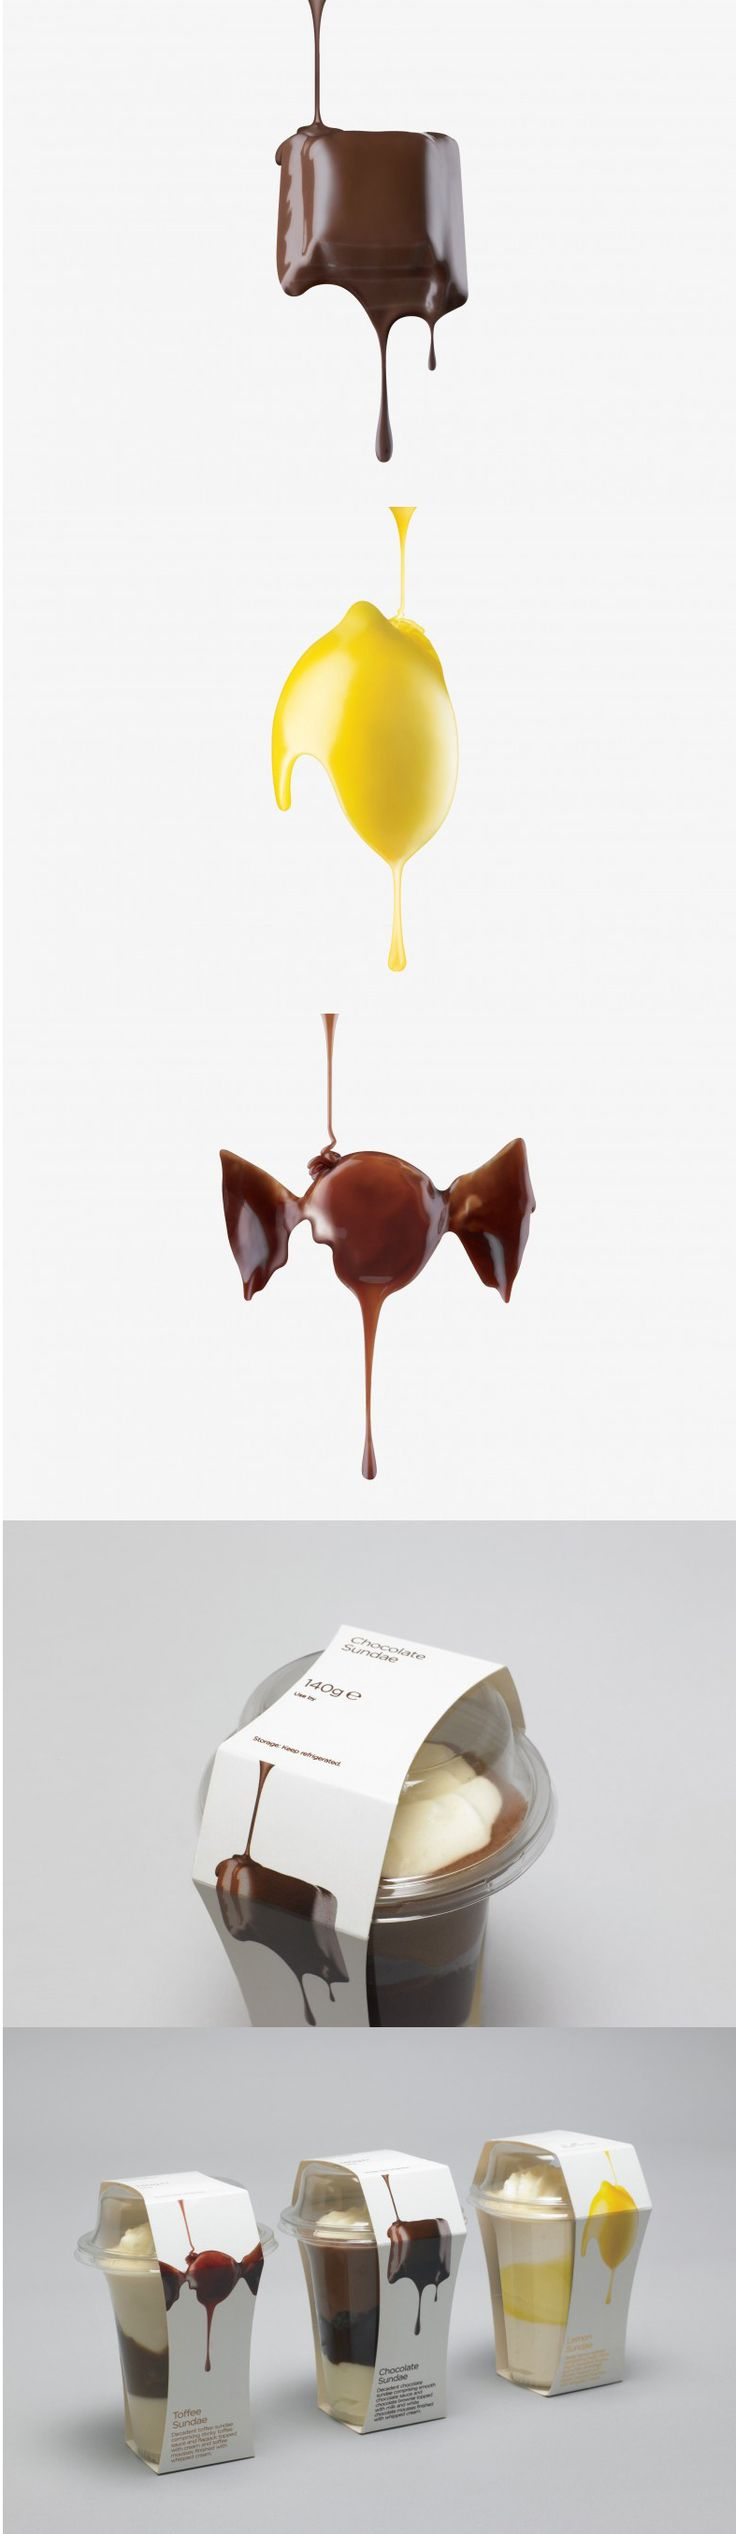 Waitrose Ice Cream Packaging Design